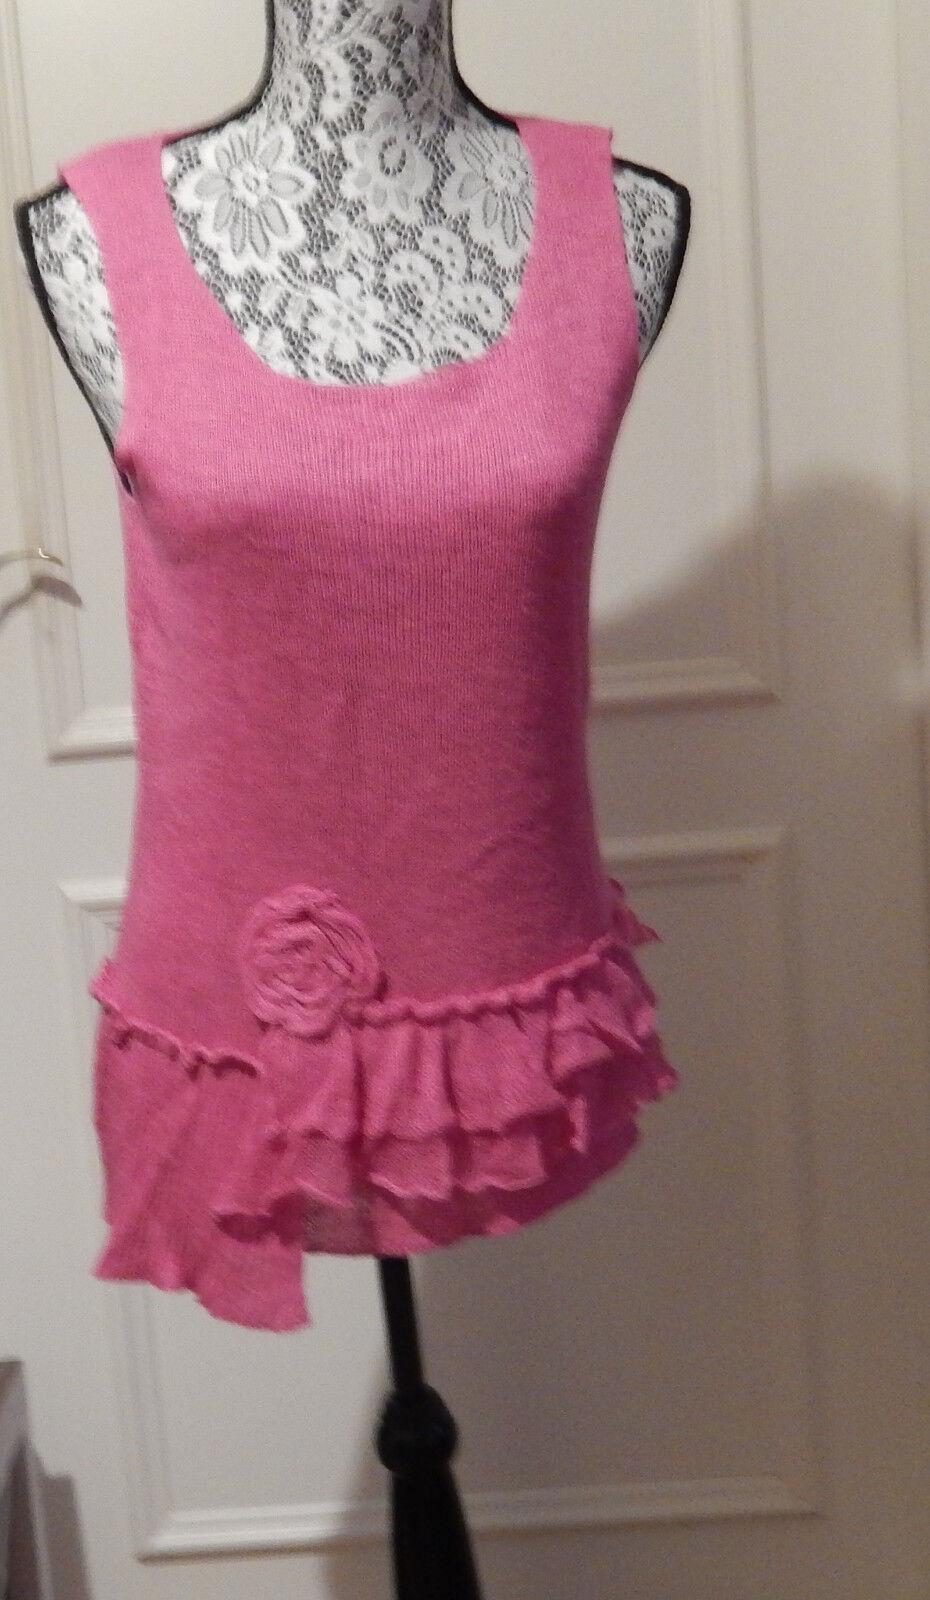 Zuza Bart Tunica Leinenstrick bonbon-Rosa XL candy-Rosa linen knit